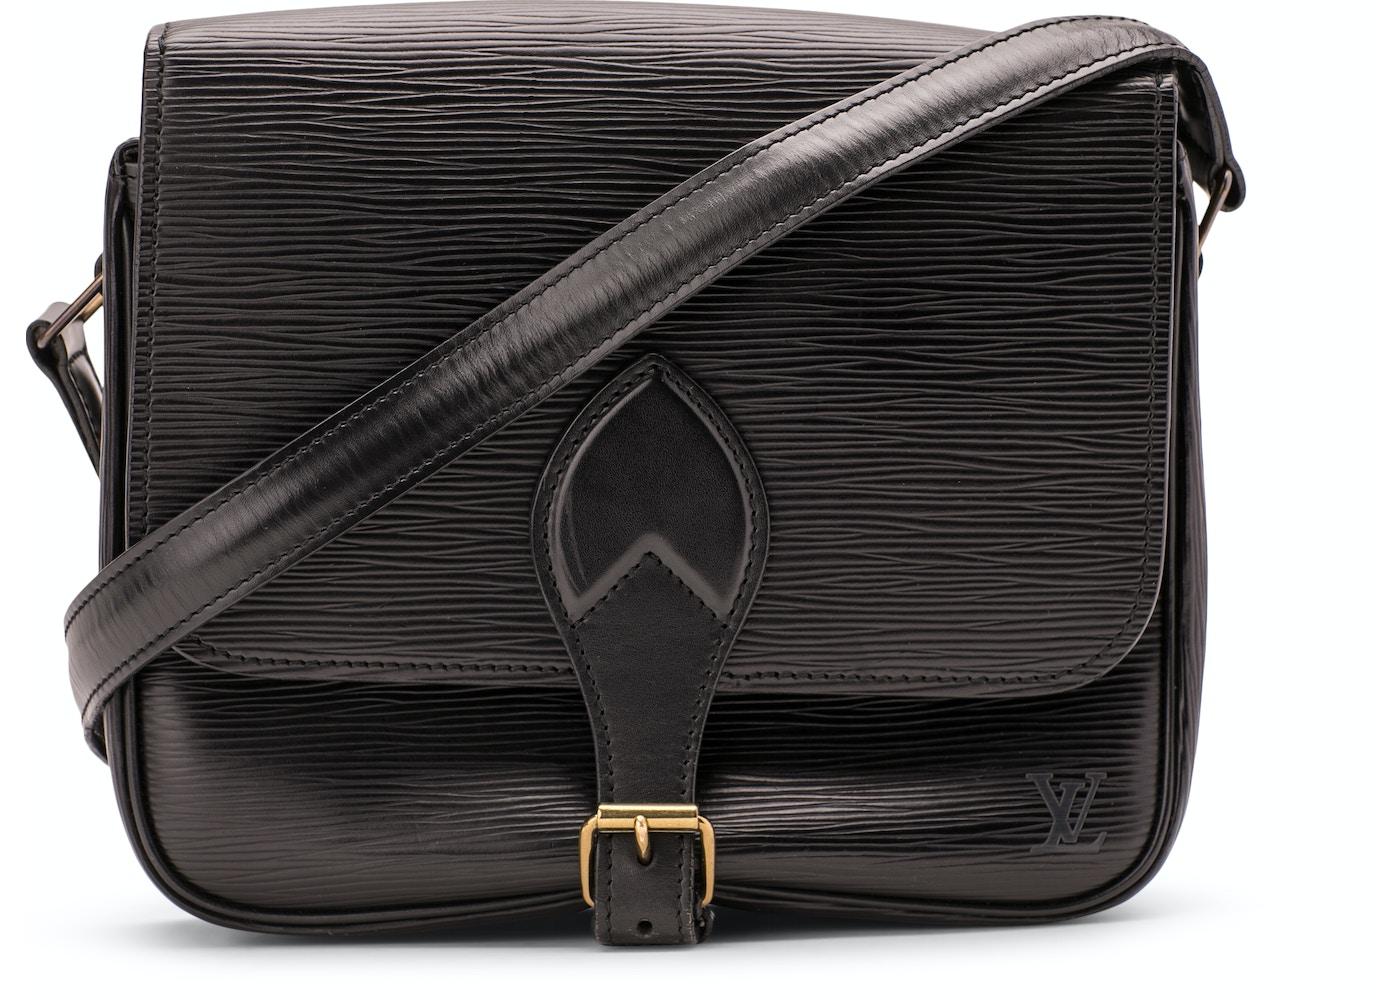 430a922b3774 Louis Vuitton Cartouchiere Crossbody Epi GM Black